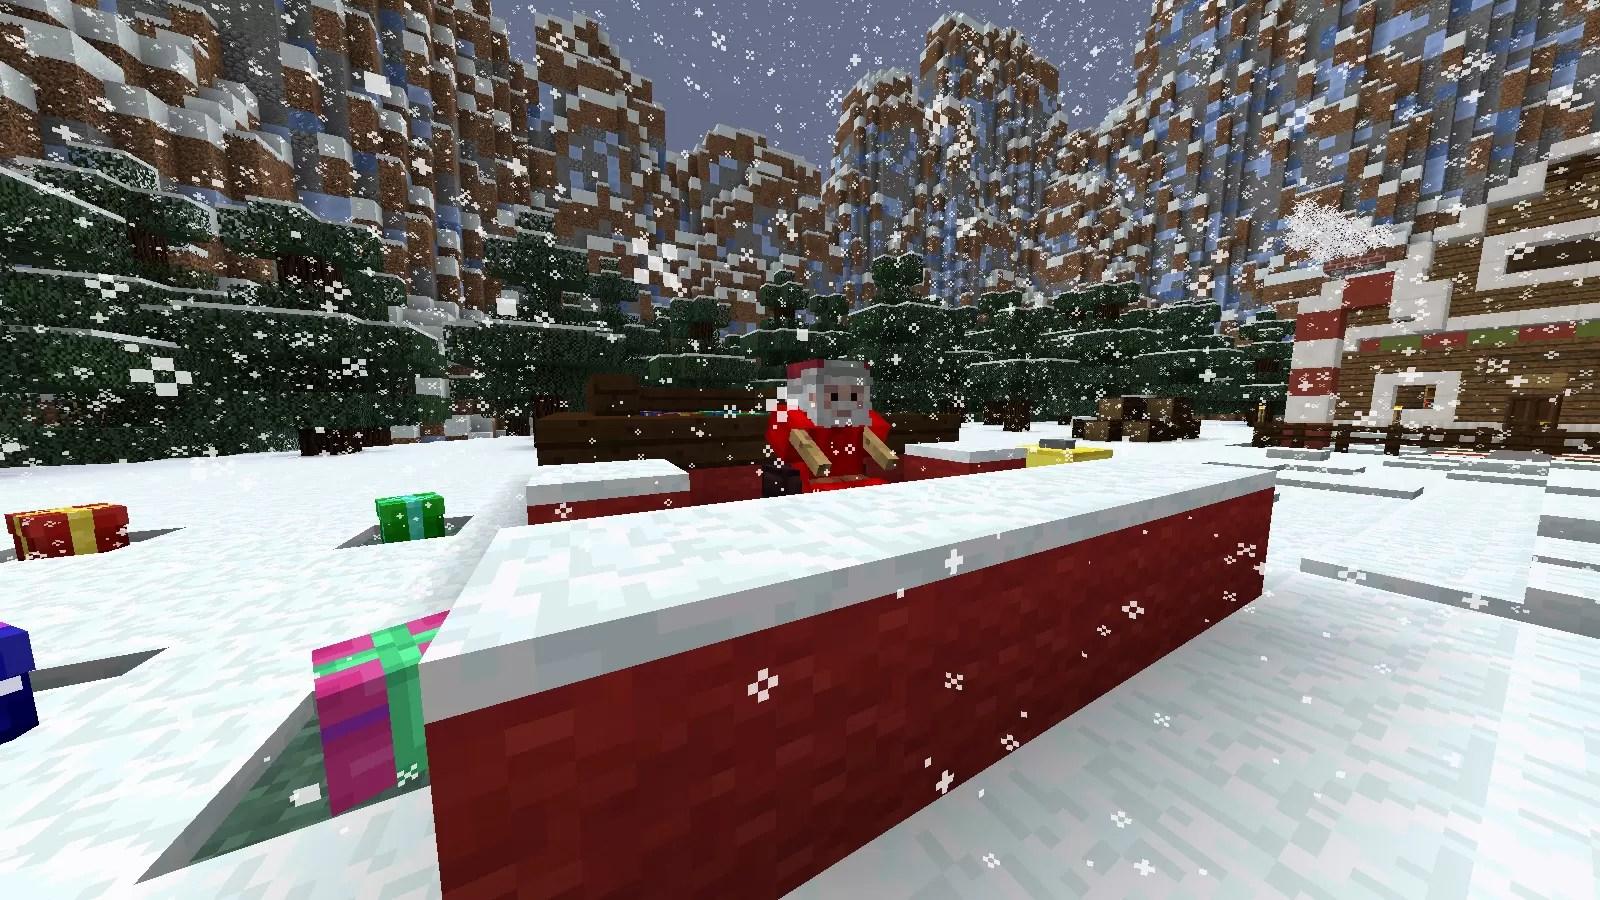 Minecraft Christmas Map.Save Christmas 2 Map For Minecraft 1 12 2 Minecraftsix